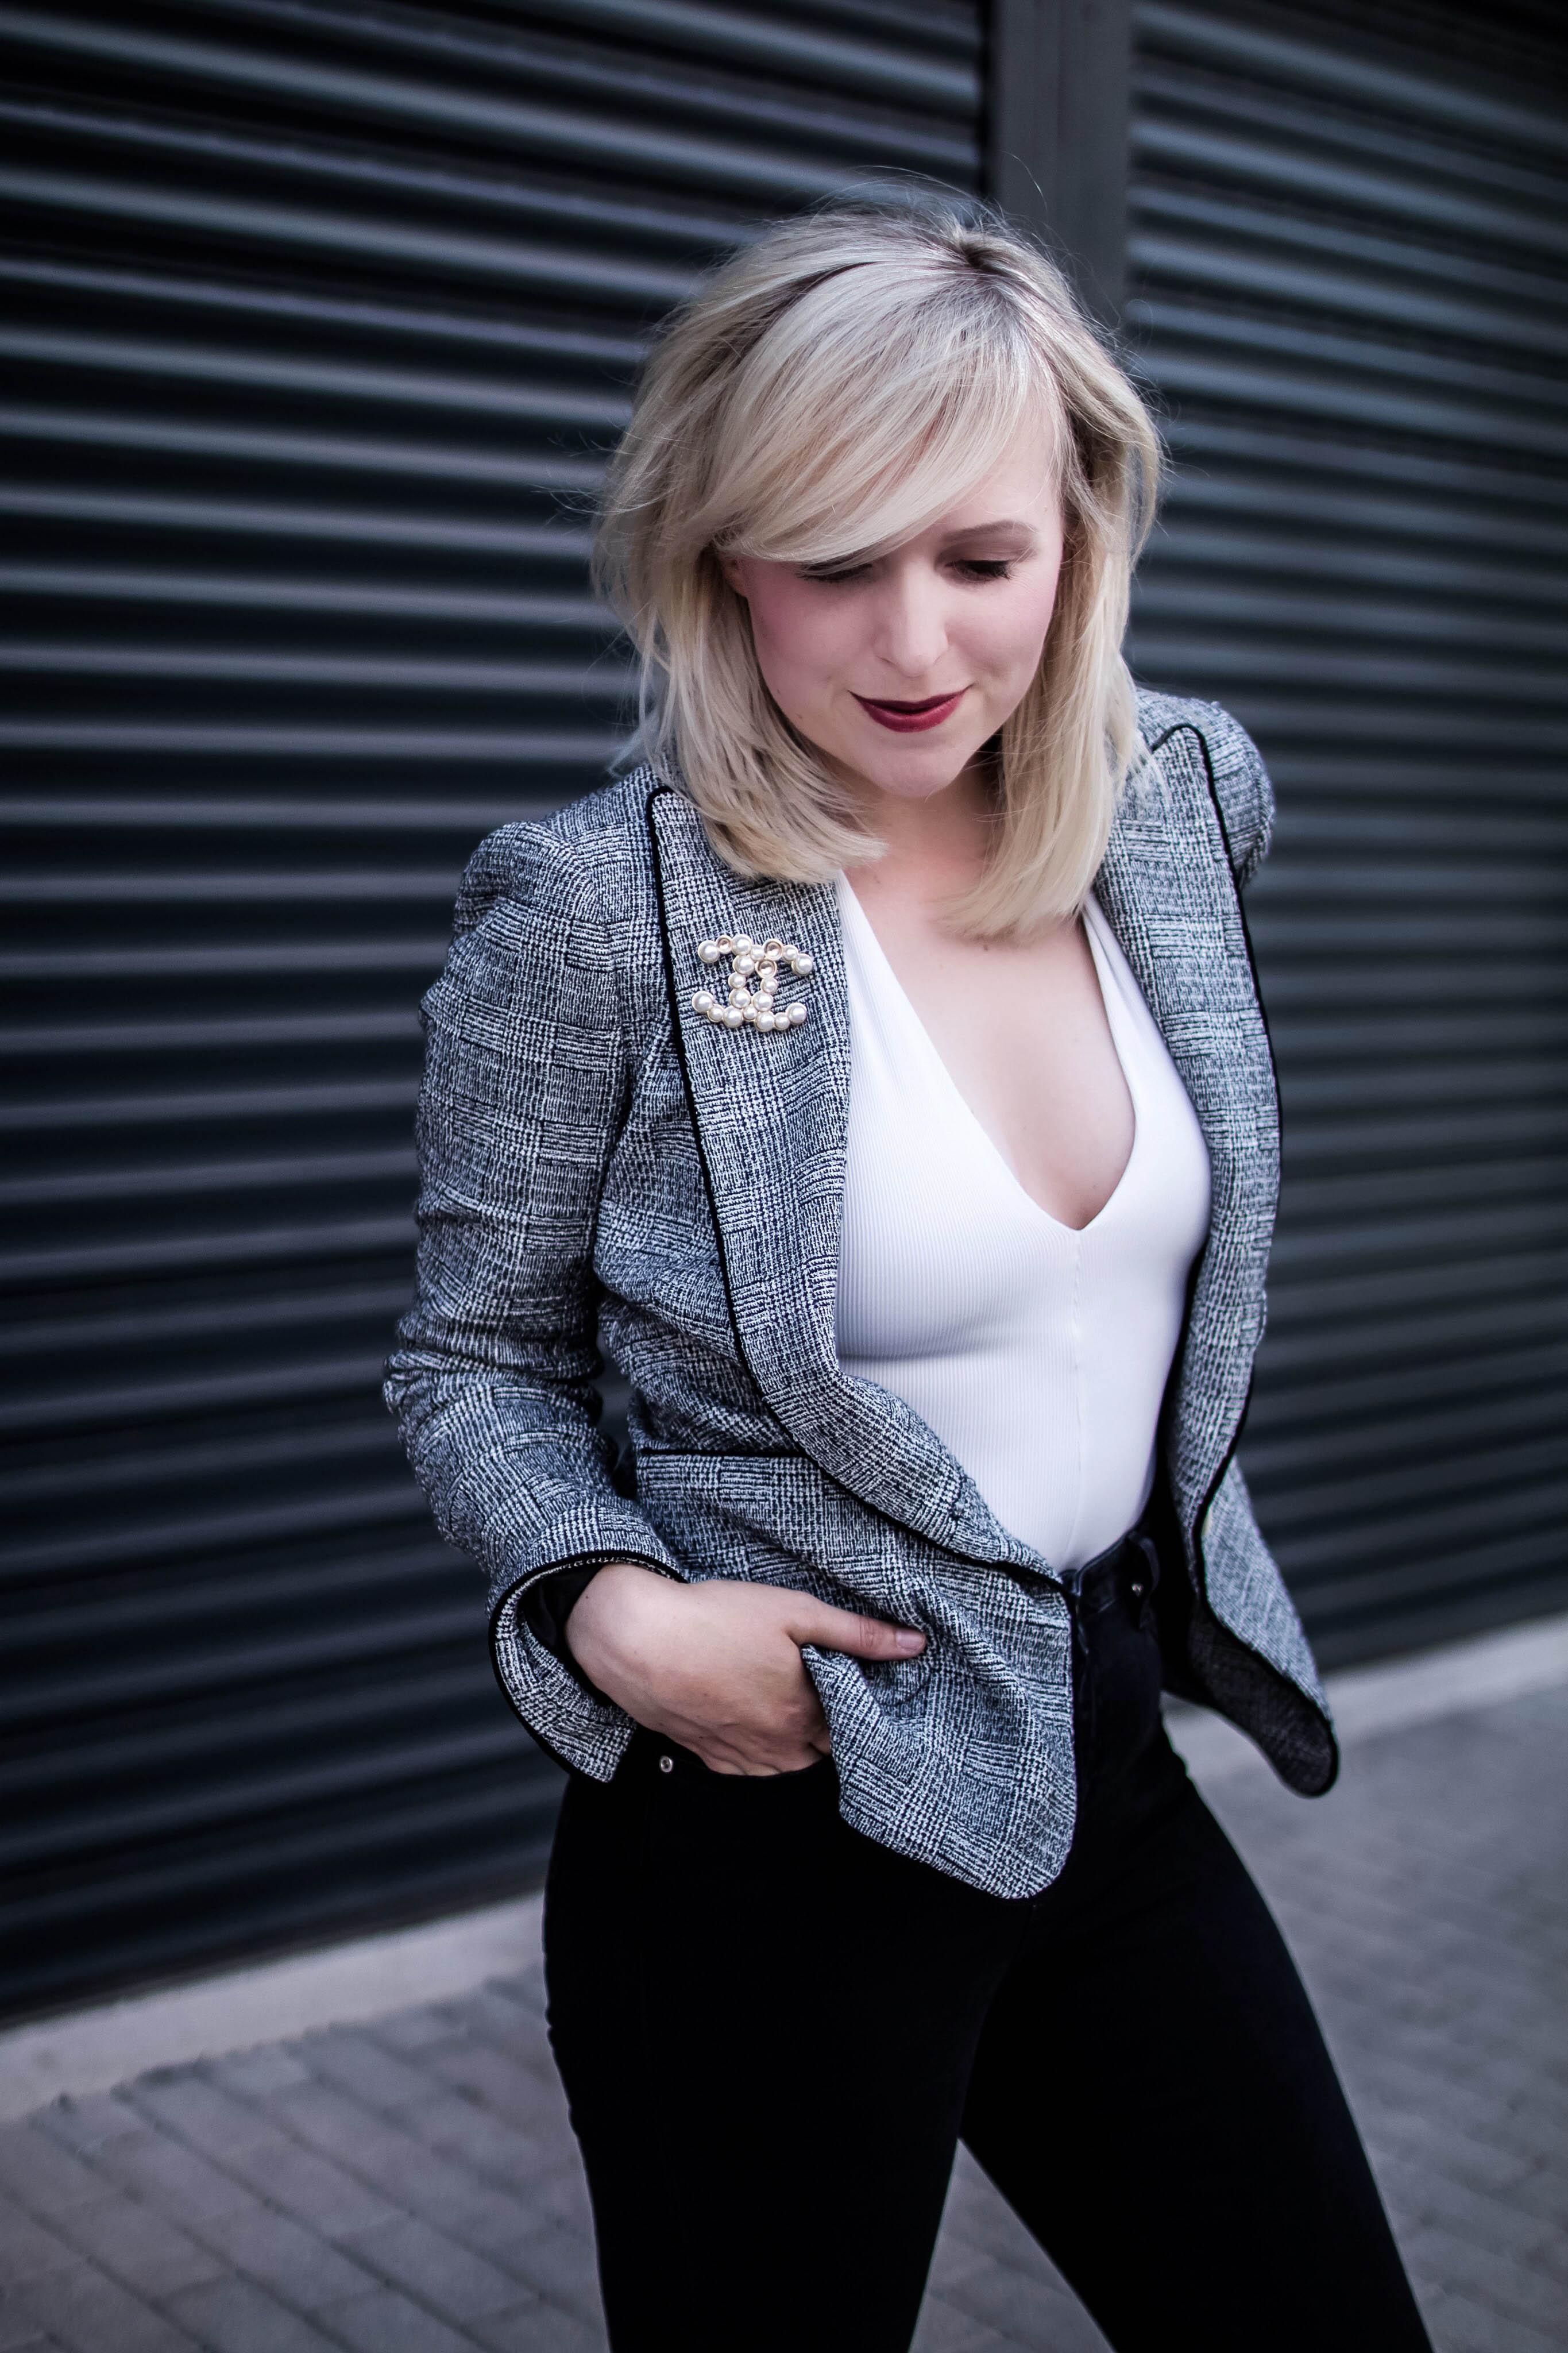 zara_blazer_chanel_casual_office_jeans_zukkermaedchen